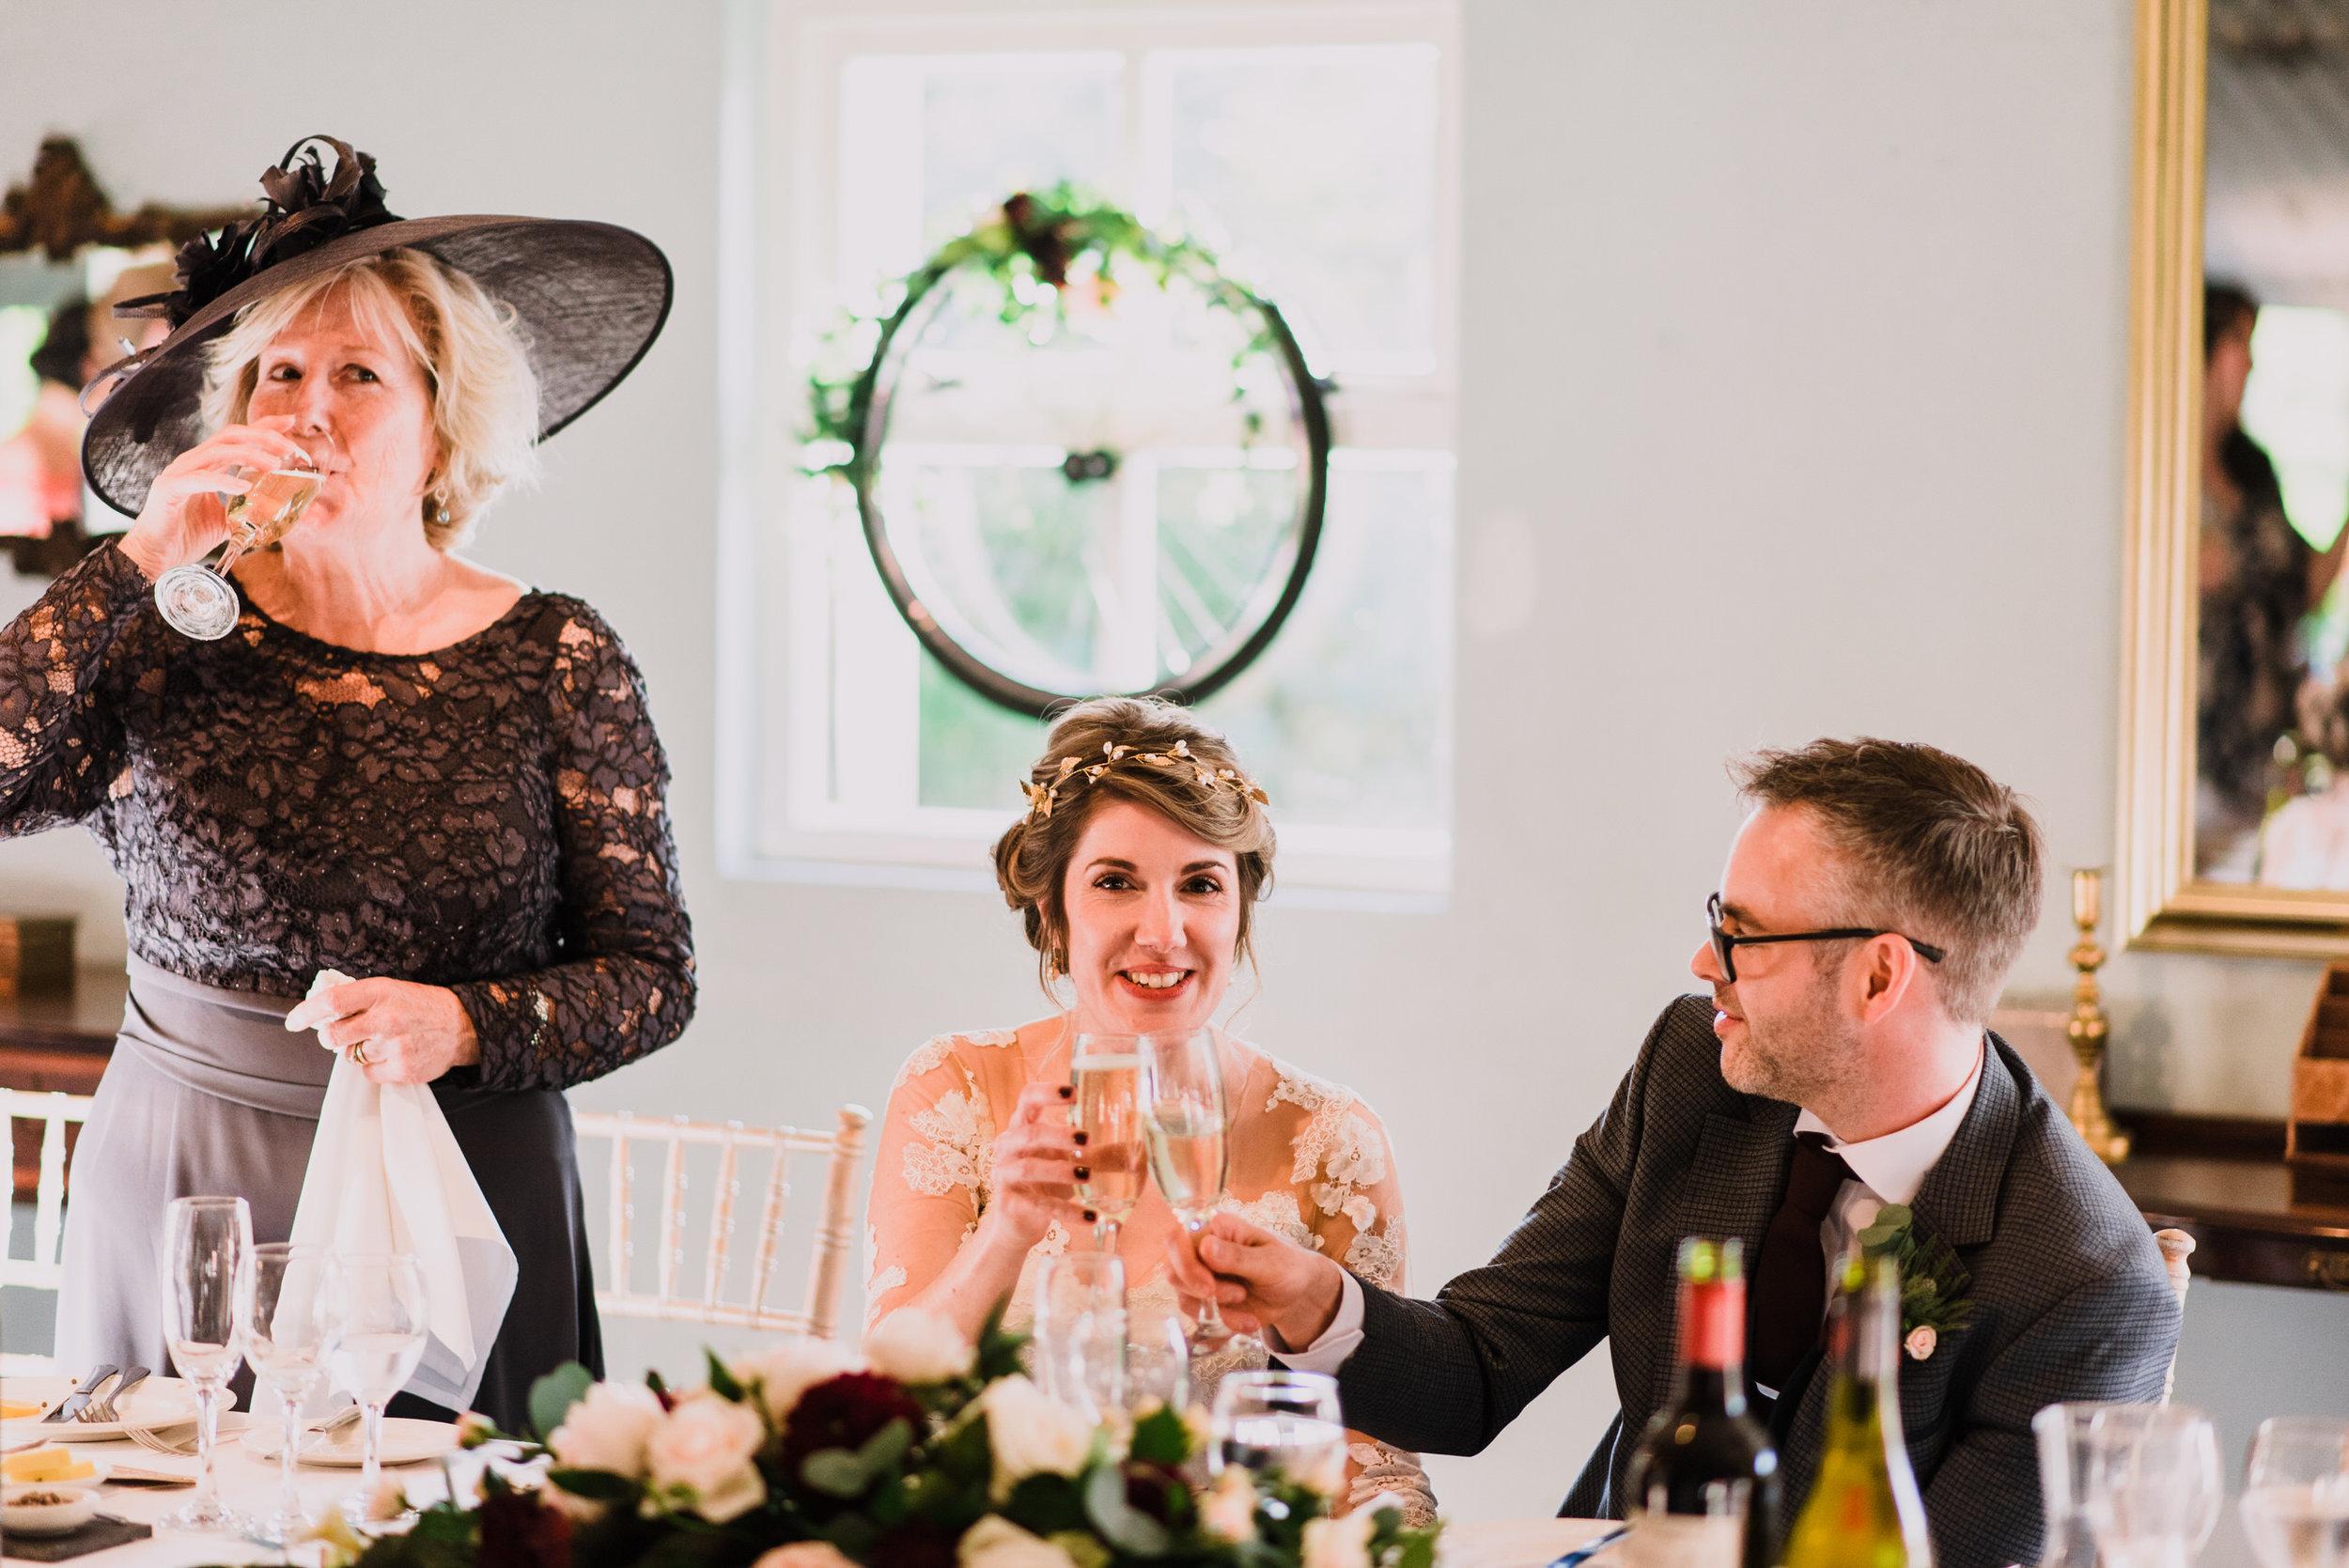 lissanoure castle wedding, northern ireland wedding photographer, romantic northern irish wedding venue, castle wedding ireland, natural wedding photography ni (113).jpg